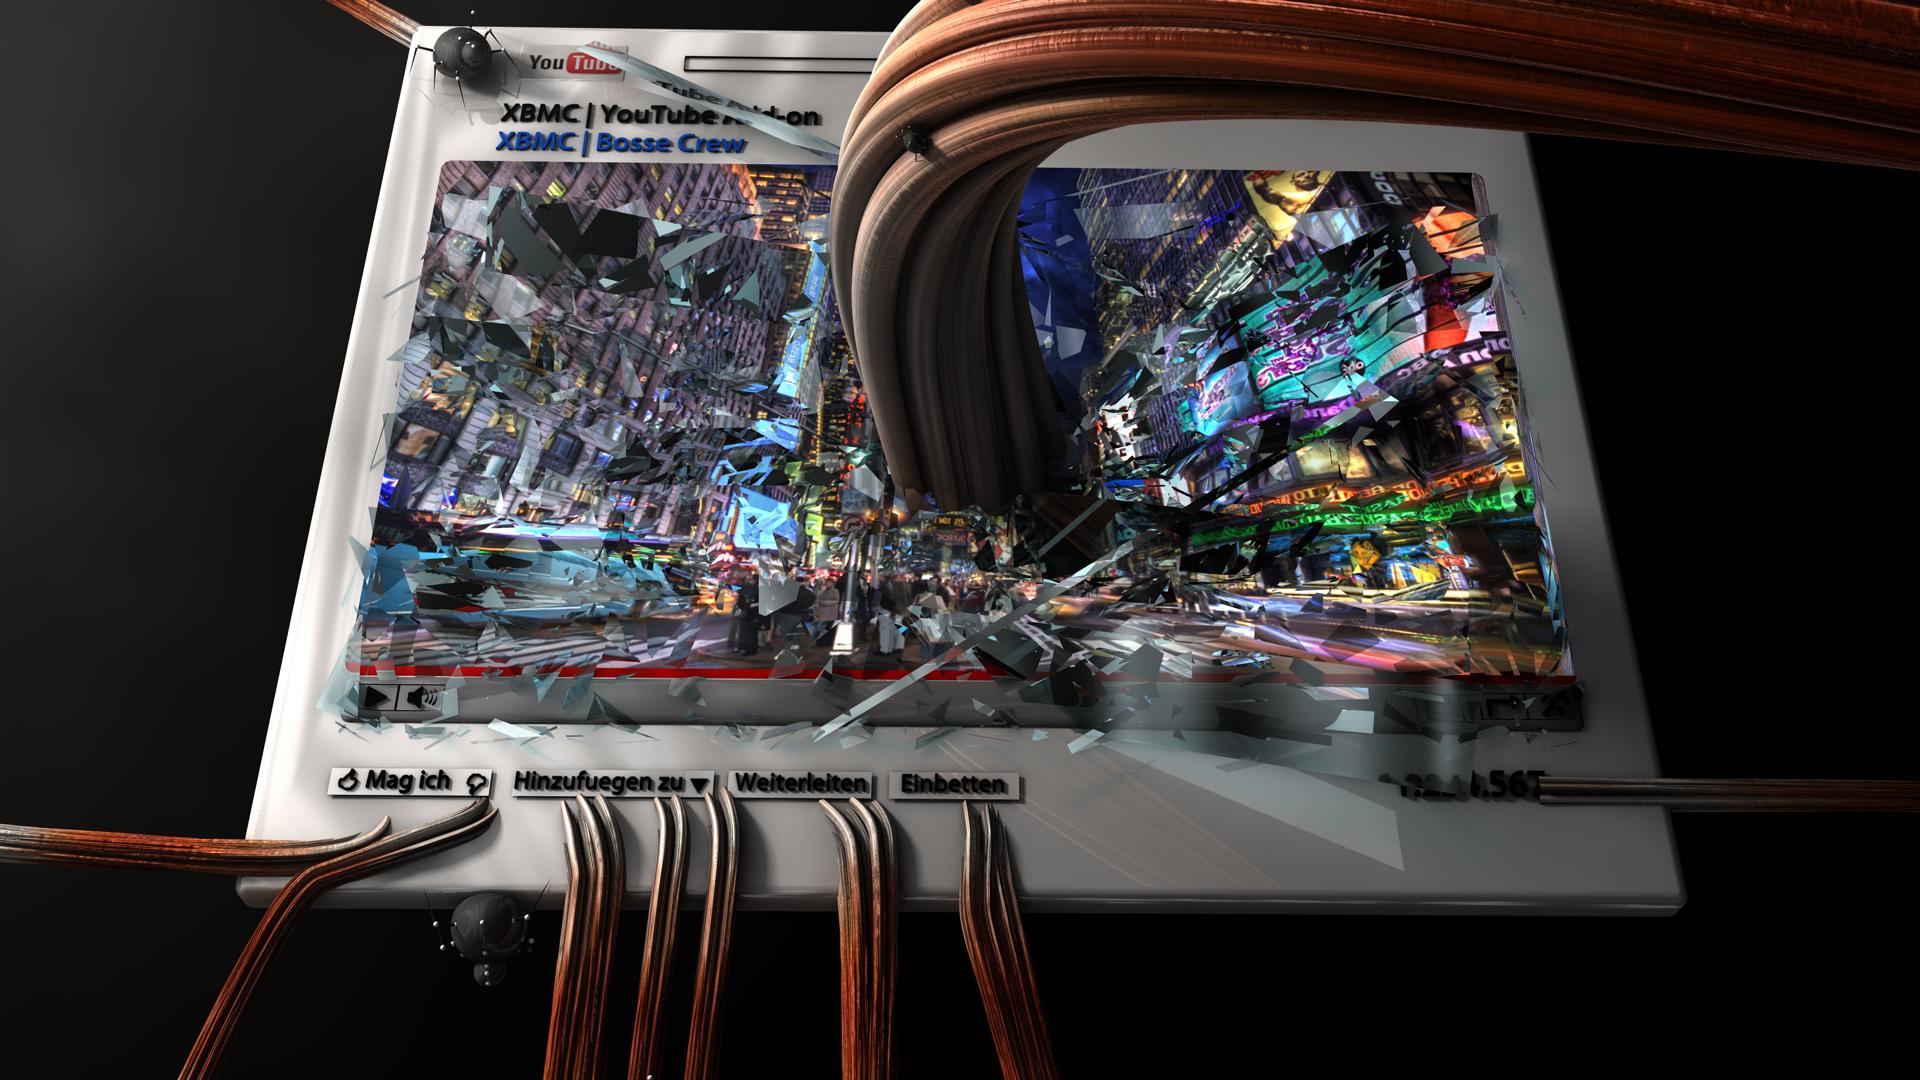 xbmc youtube 1080p by rayspoint on deviantart